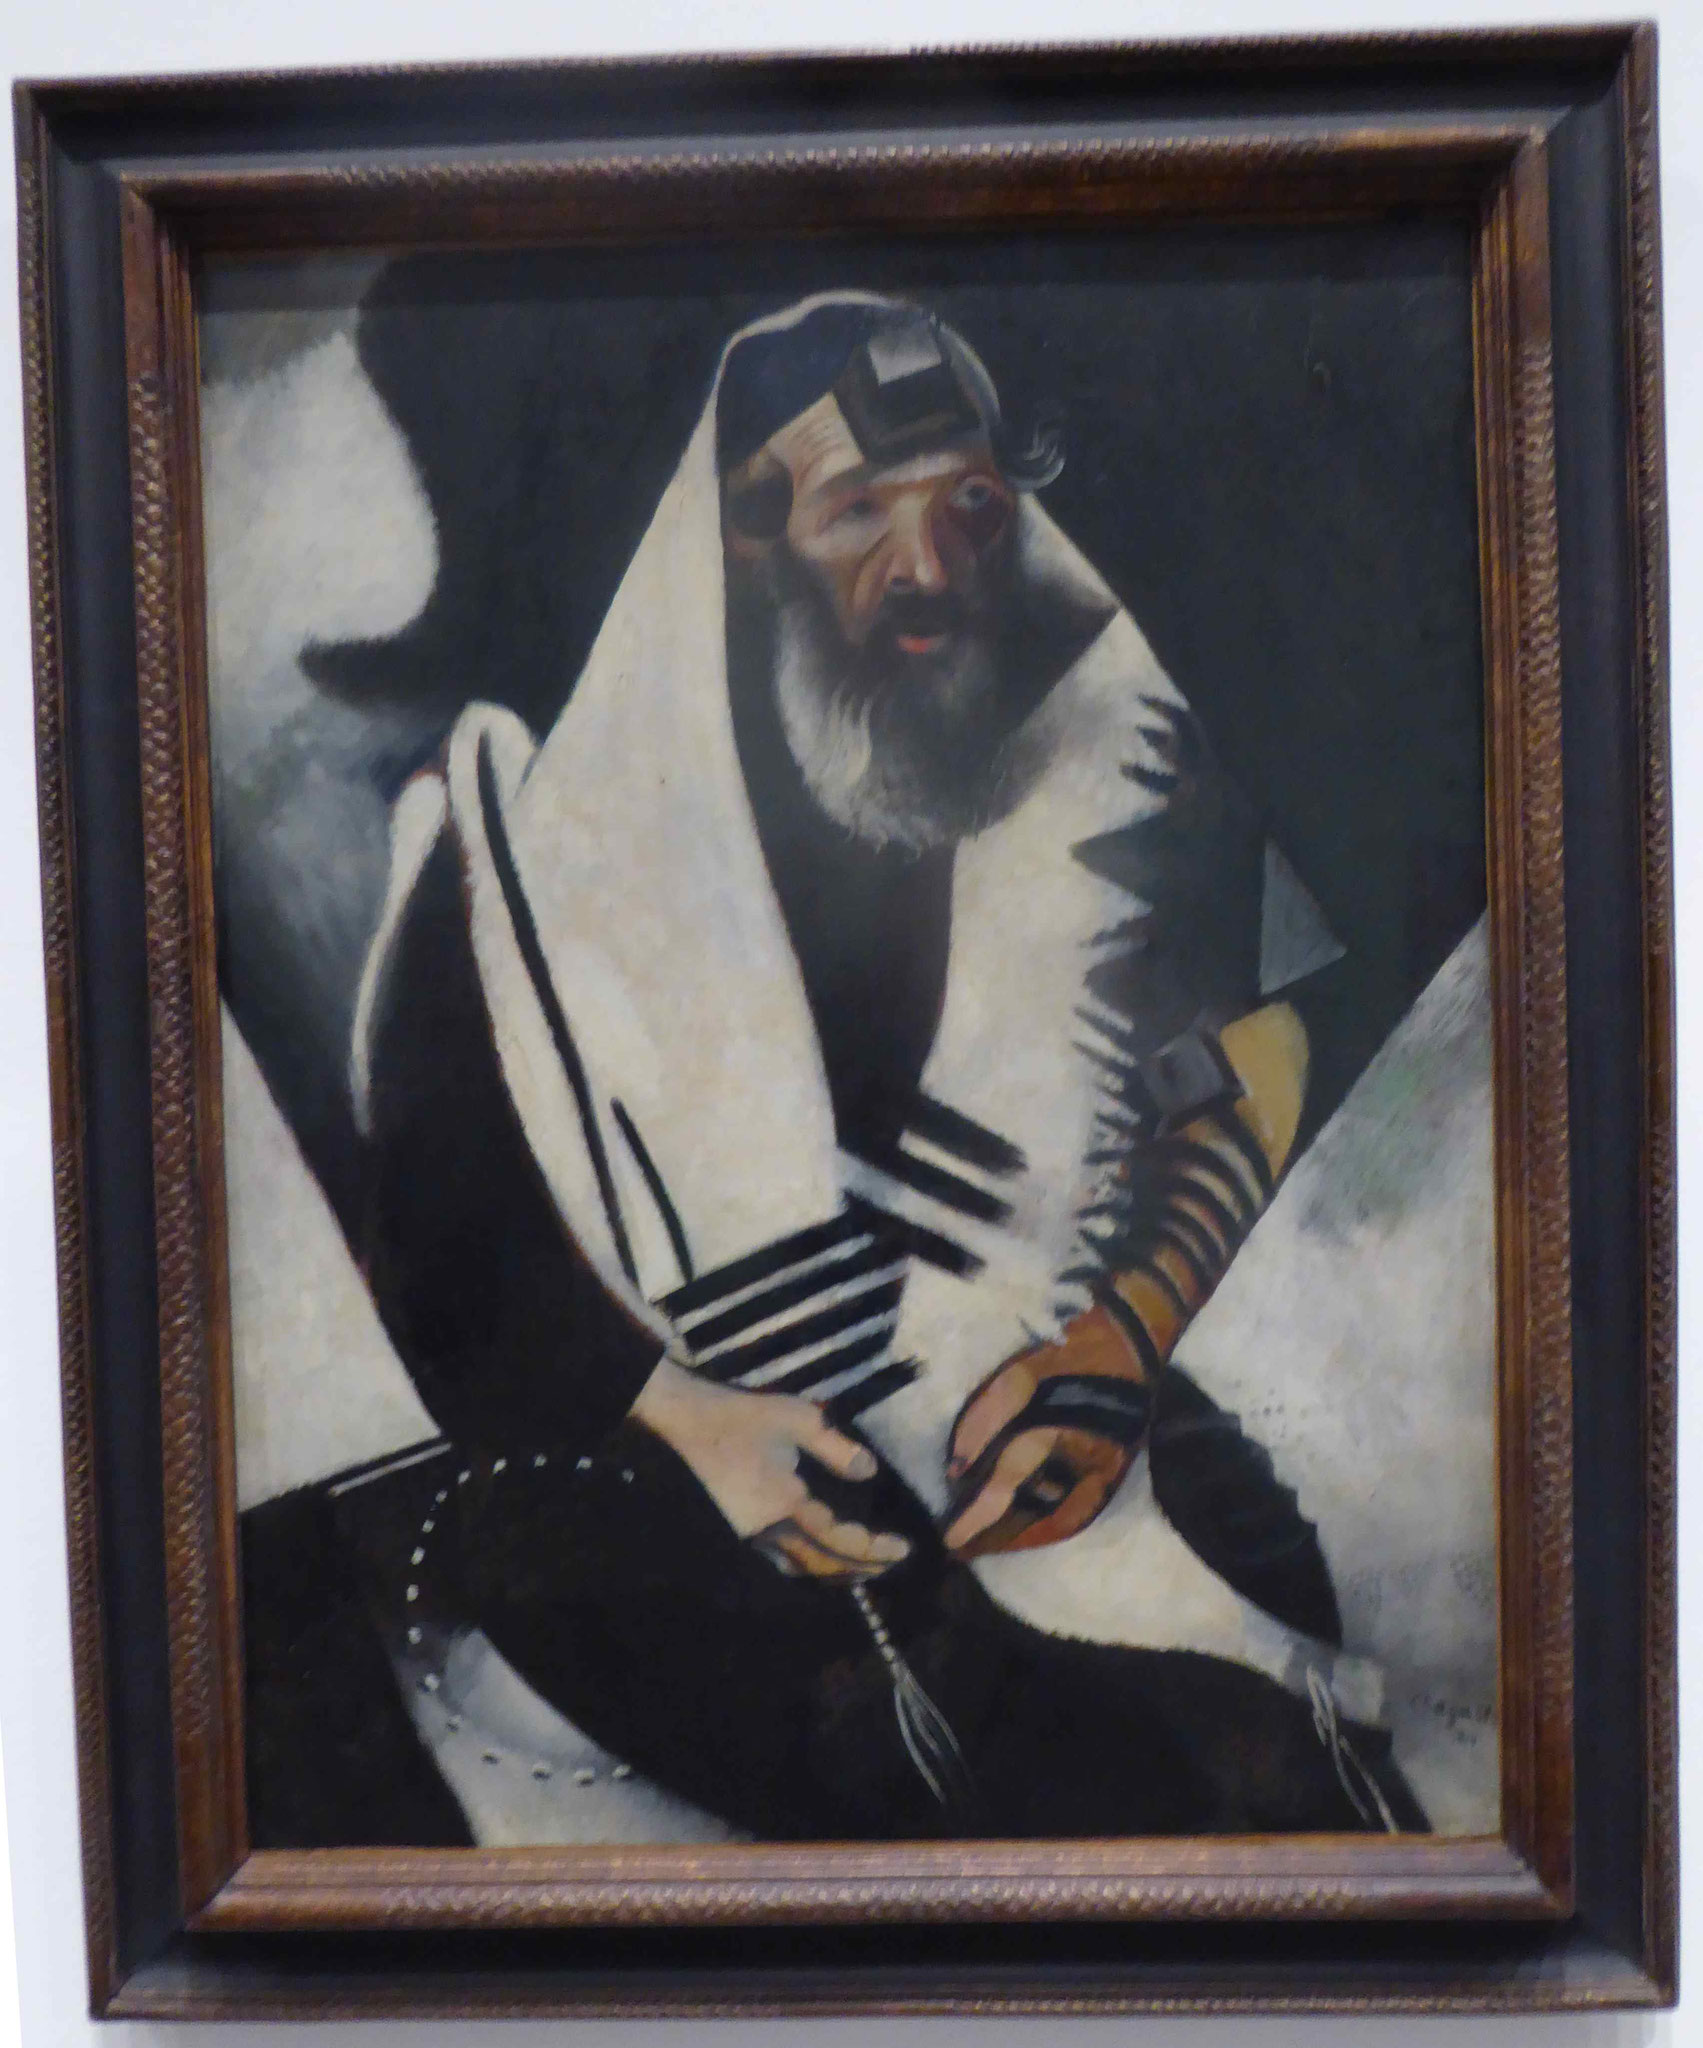 Marc Chagal, Museo Reina Sofia, Madrid, Spanien